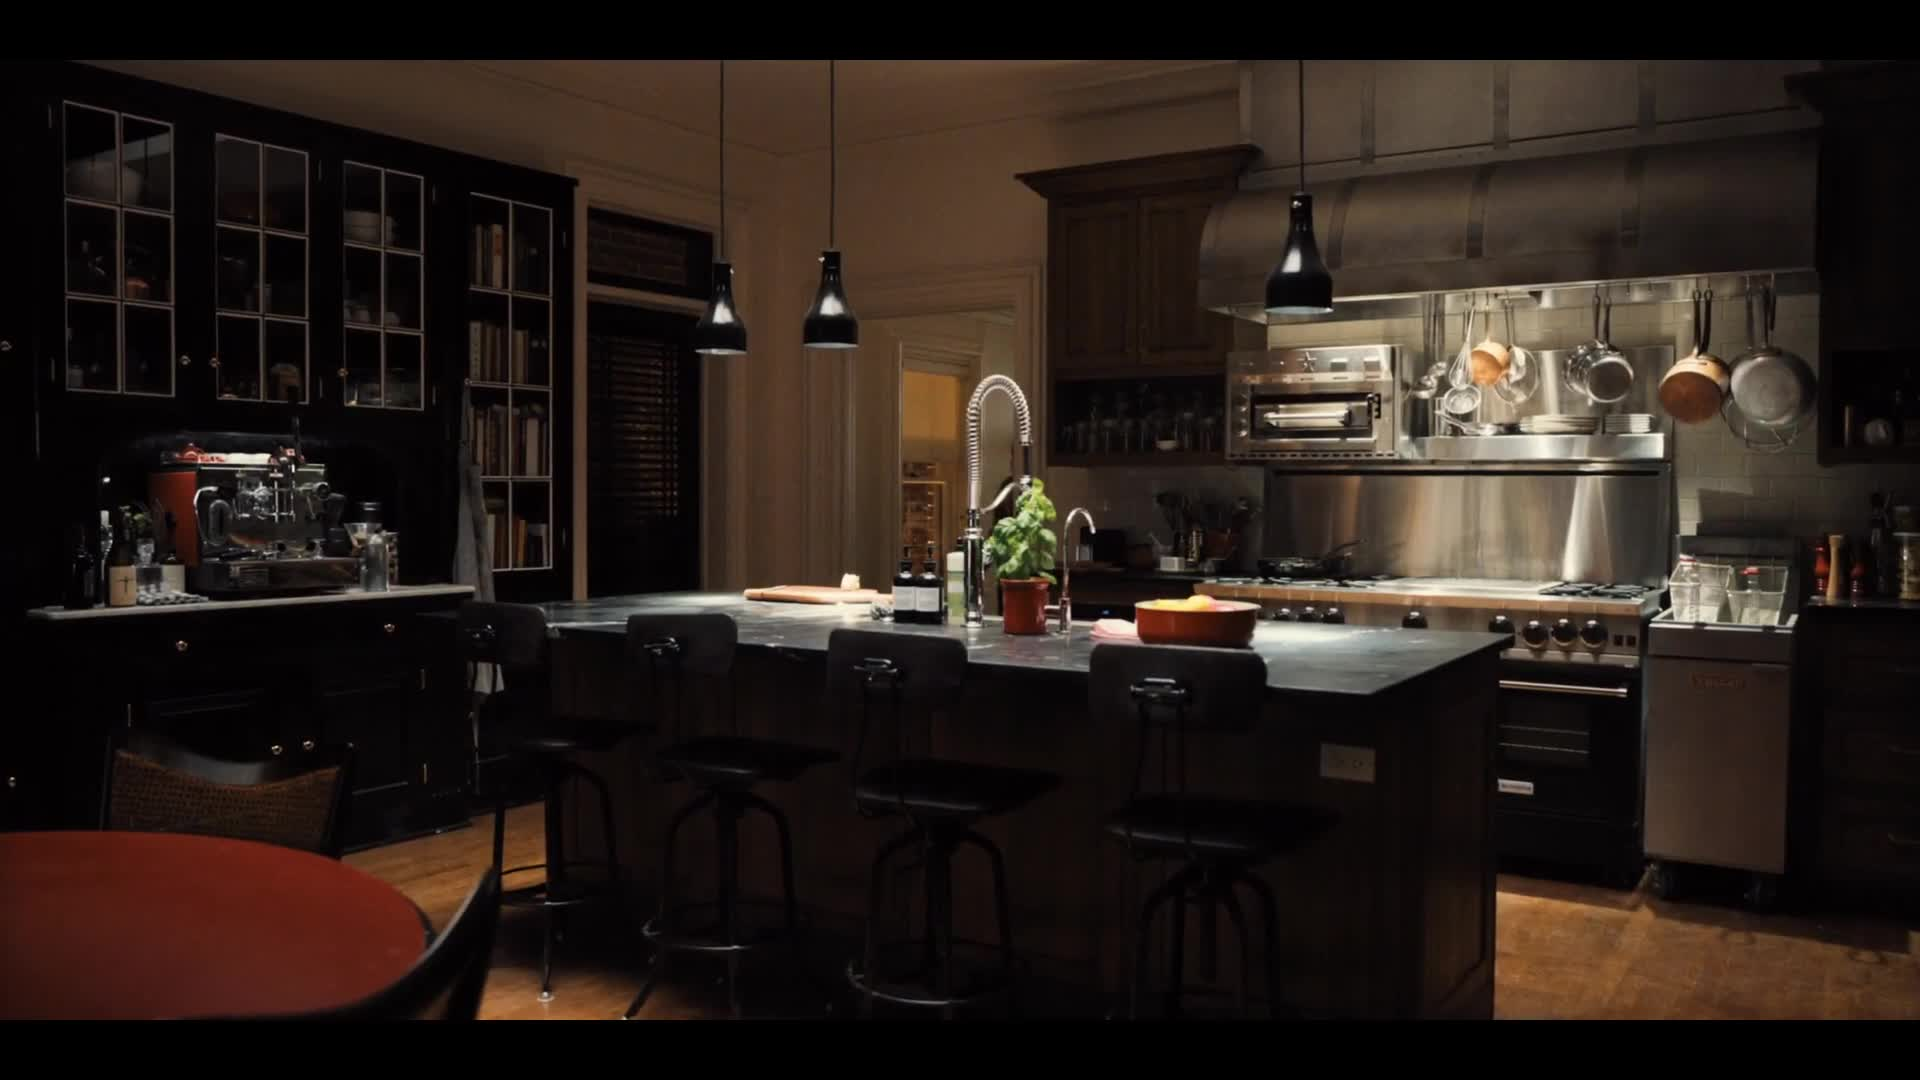 Servant - Official Trailer [HD] screen capture